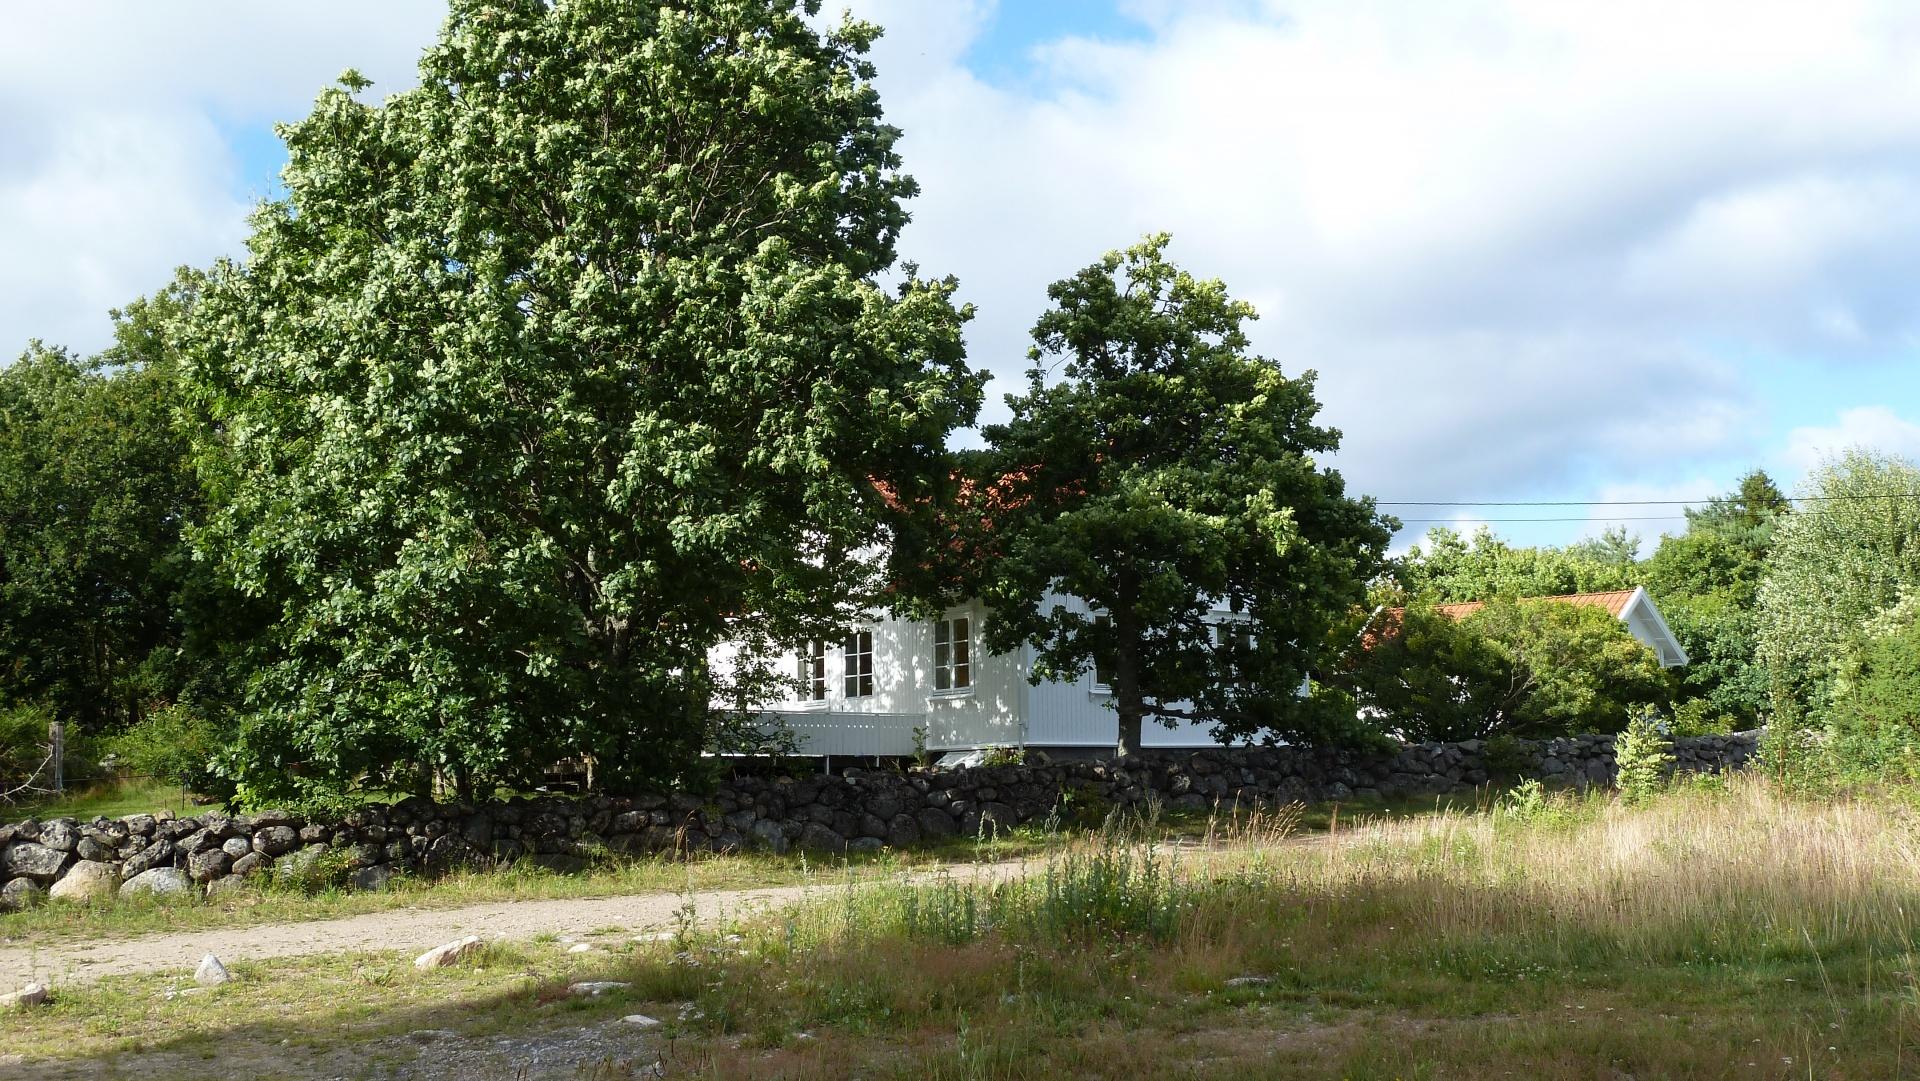 Havna på Søndre Sandøy, Hvaler juli 2010